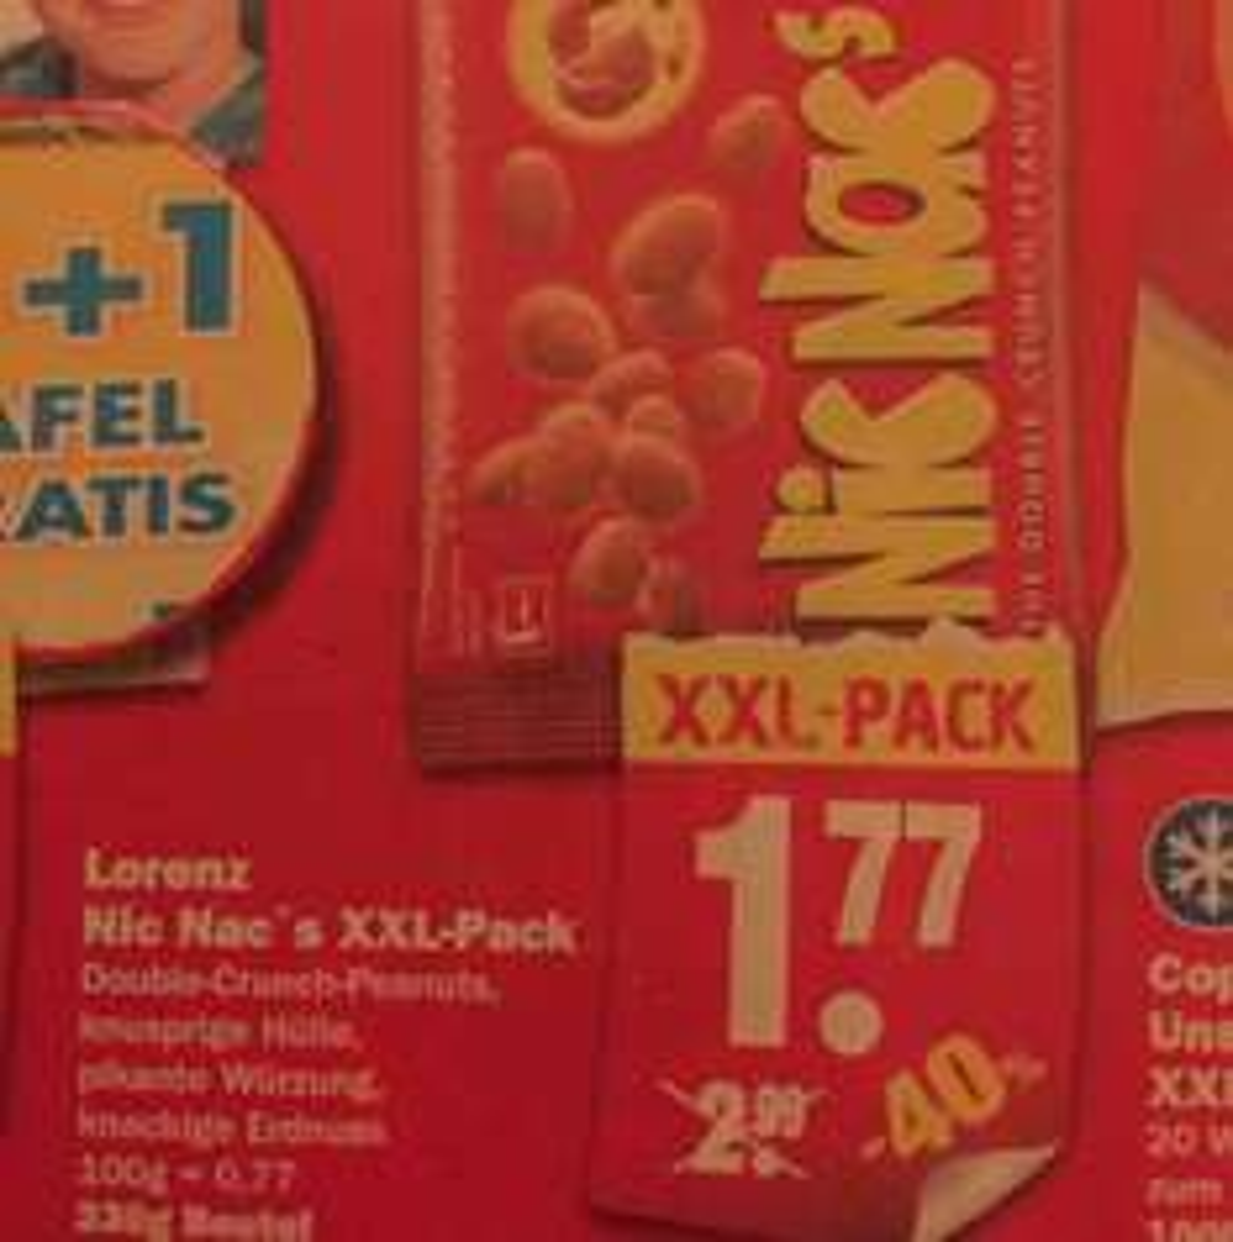 Lorenz Nic Nac's XXL-Pack 230g [Lokal NP]